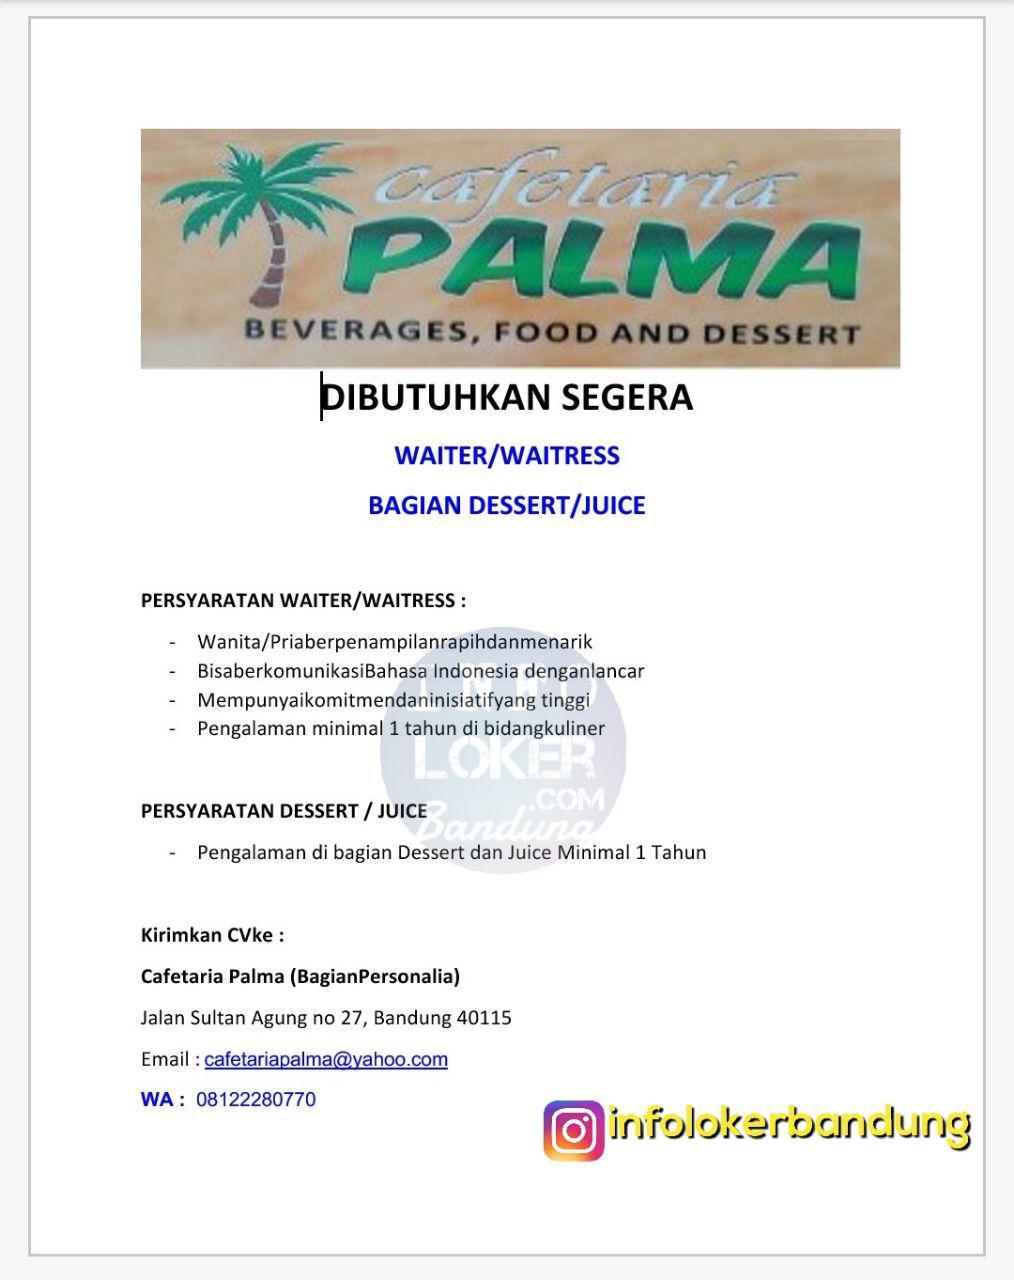 Lowongan Kerja Cafetaria Palma Bandung November 2017